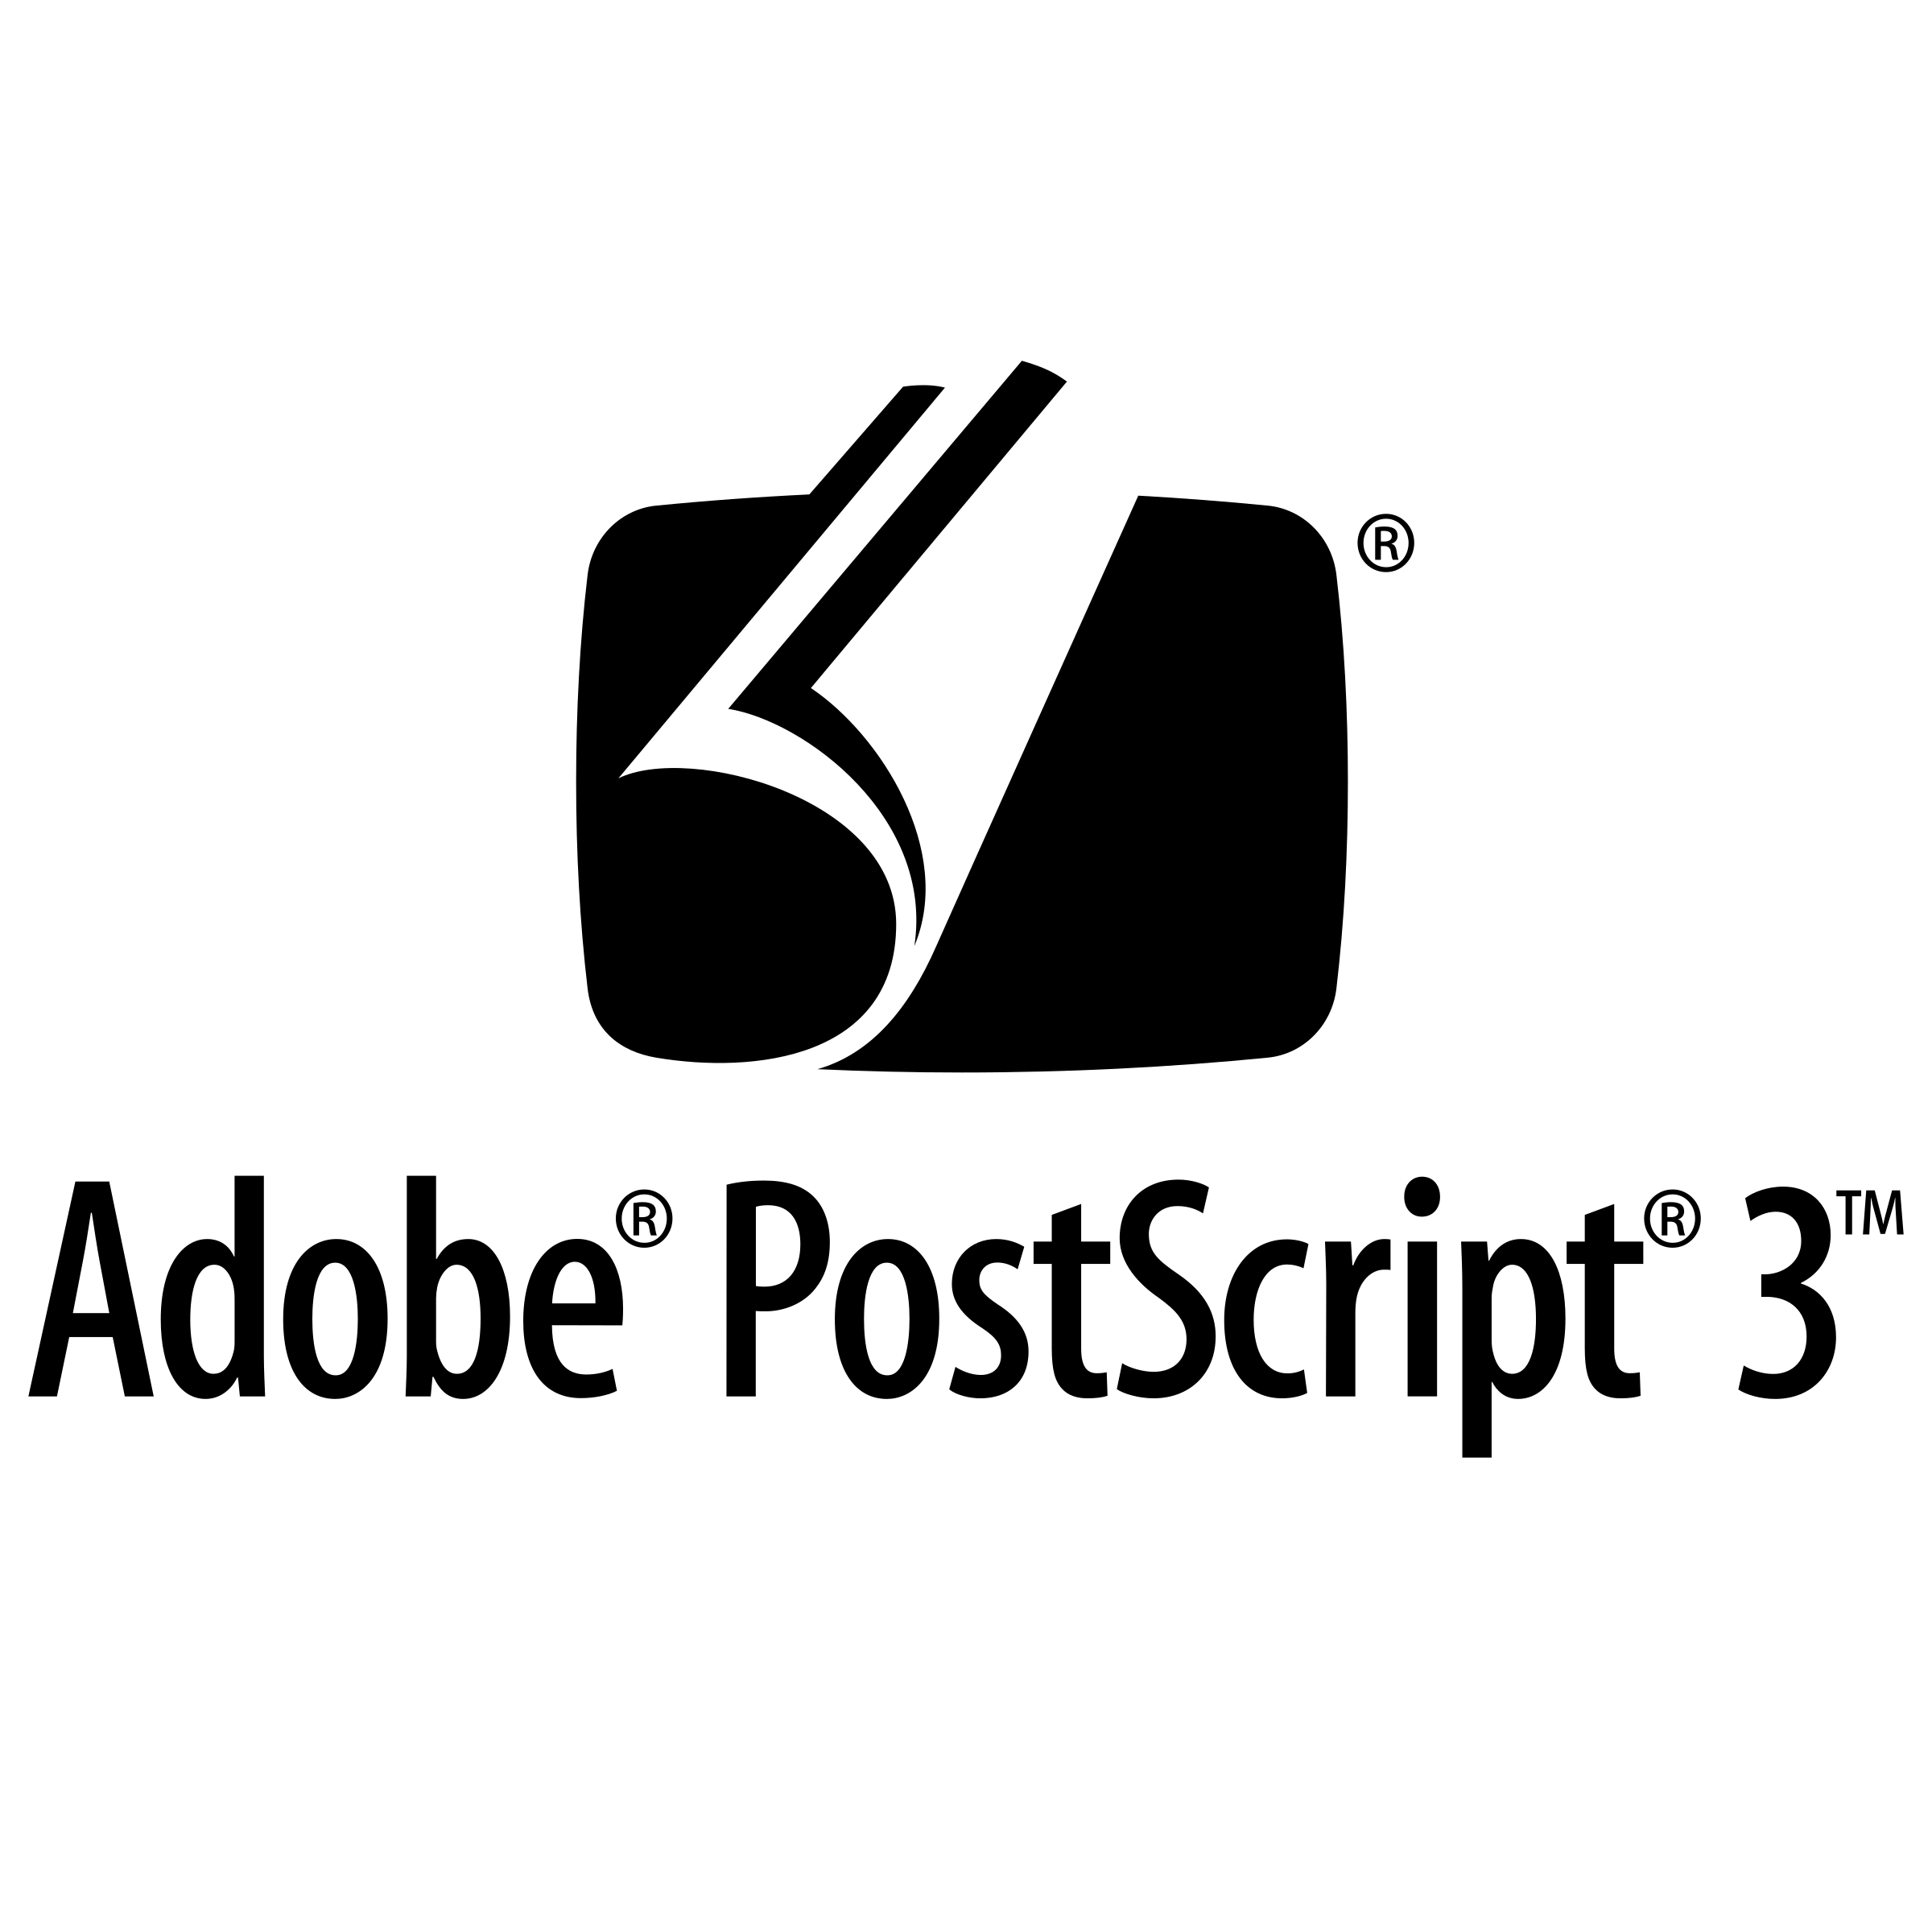 picture library download Adobe svg vector. Postscript logo png transparent